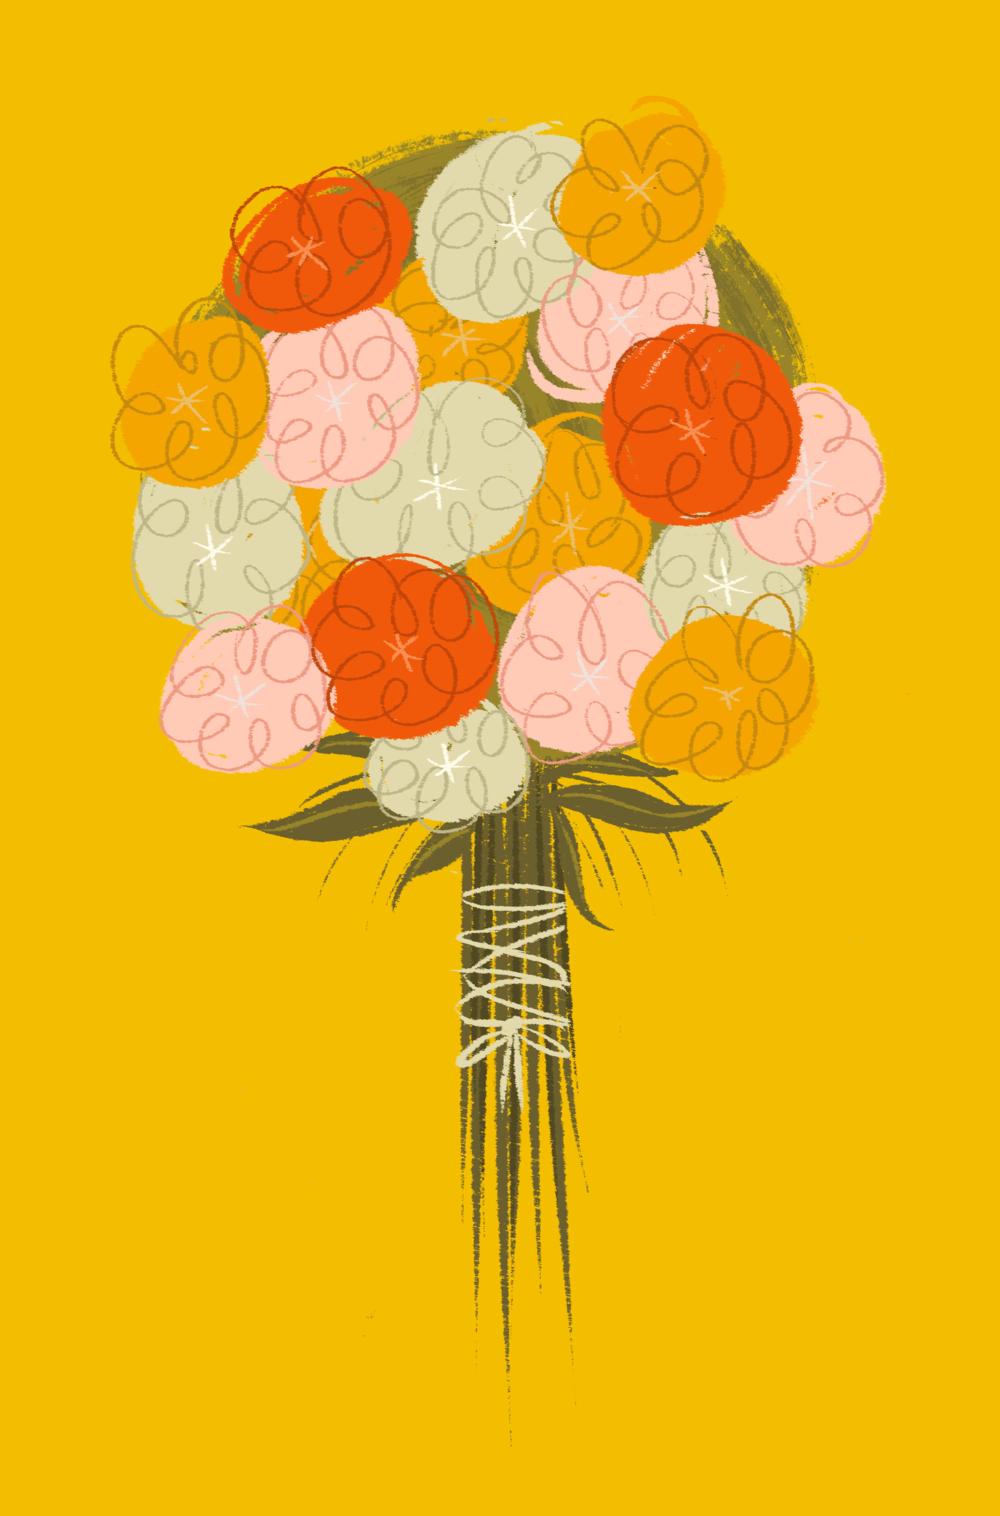 Flowery - 2015